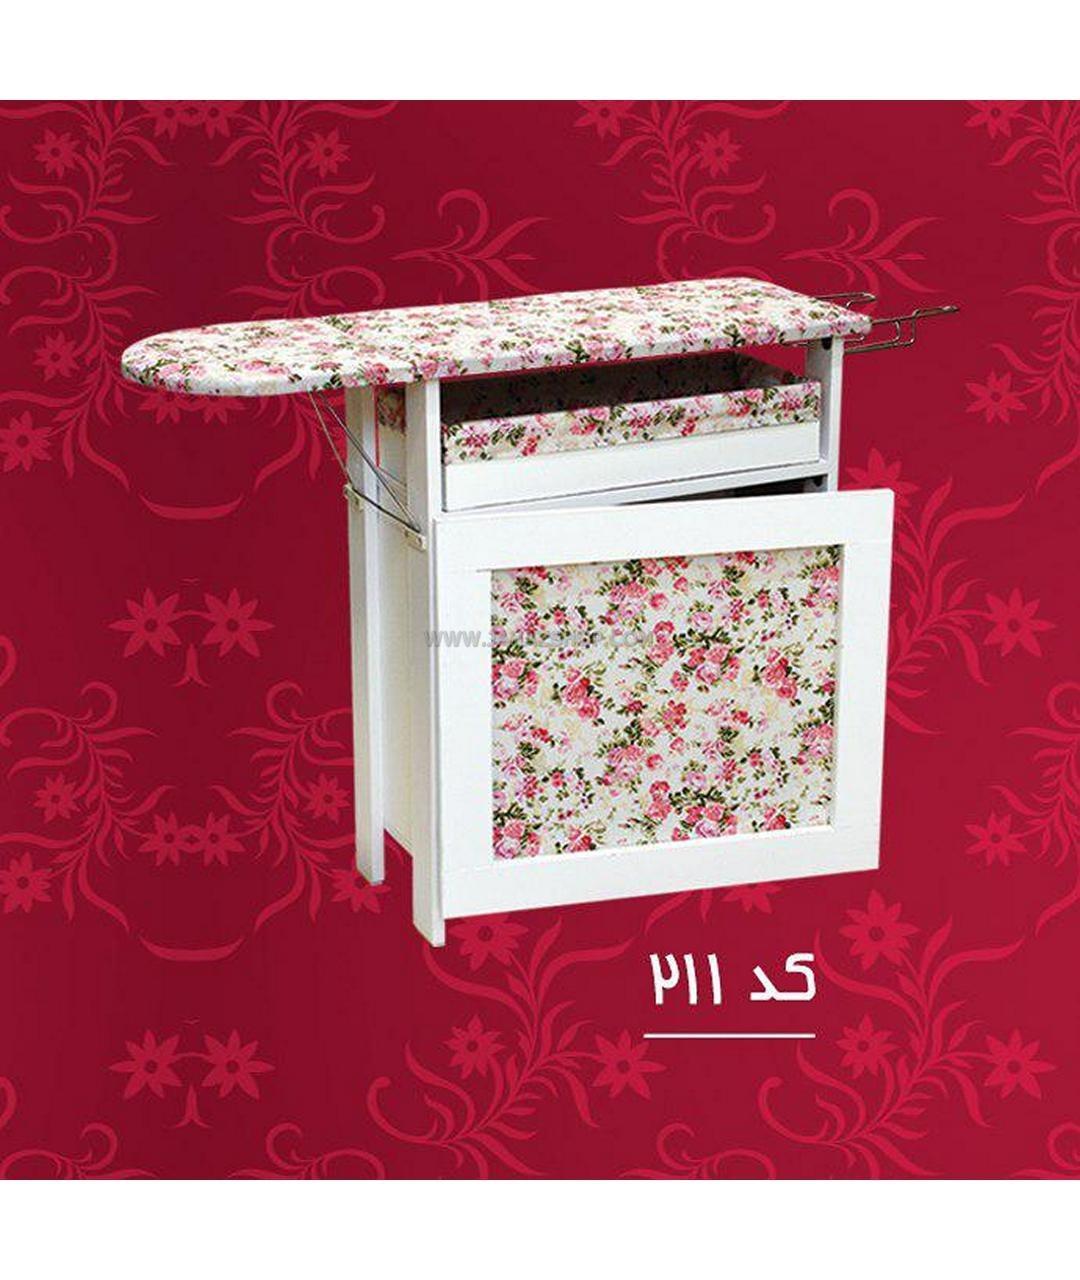 عکس میز اتو چوبی باکس دار کد ۲۱۱  میز-اتو-چوبی-باکس-دار-کد-211